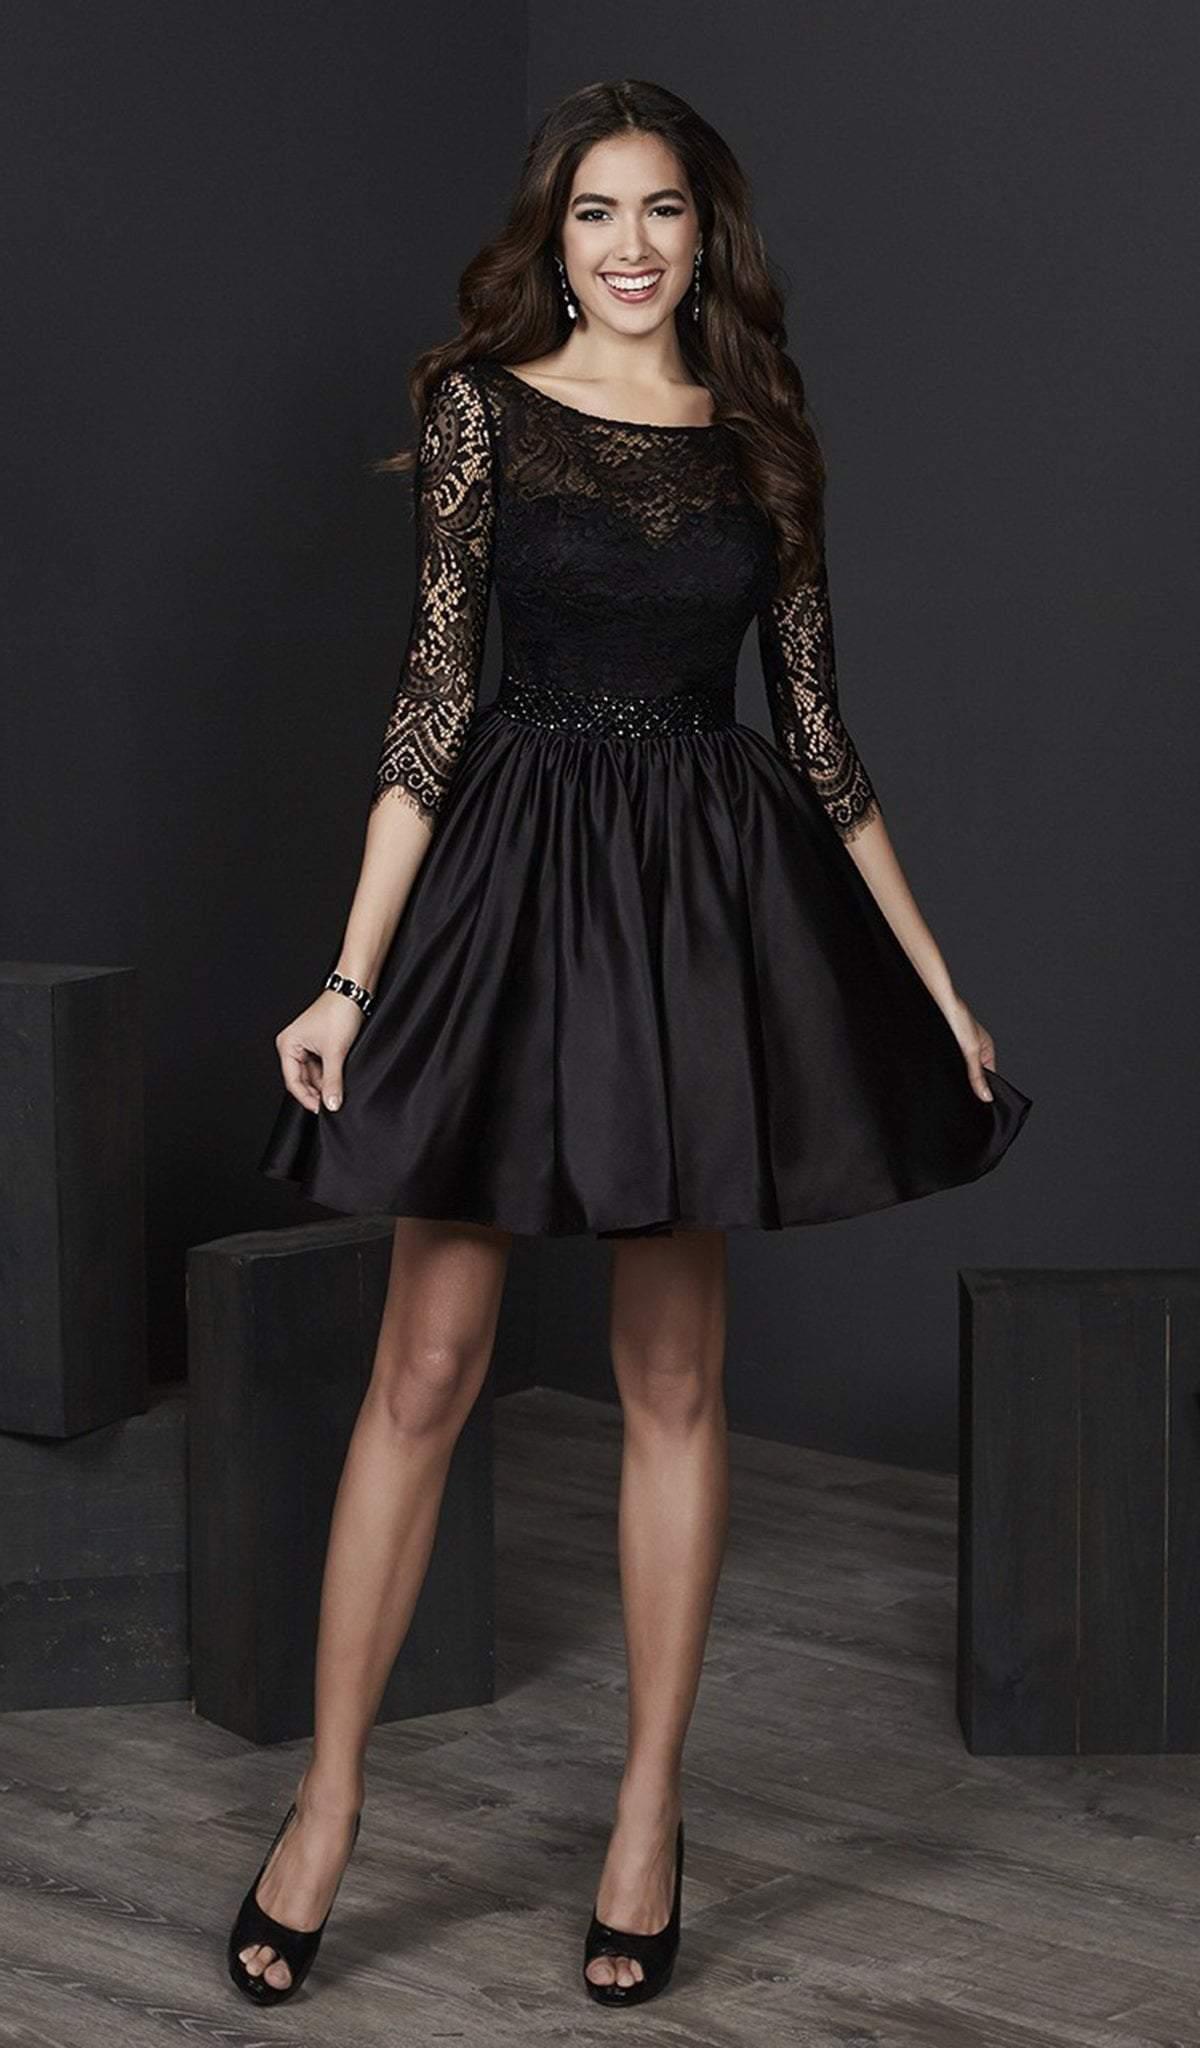 Tiffany Homecoming - 27202 Illusion Quarter Sleeve Lace A-Line Dress